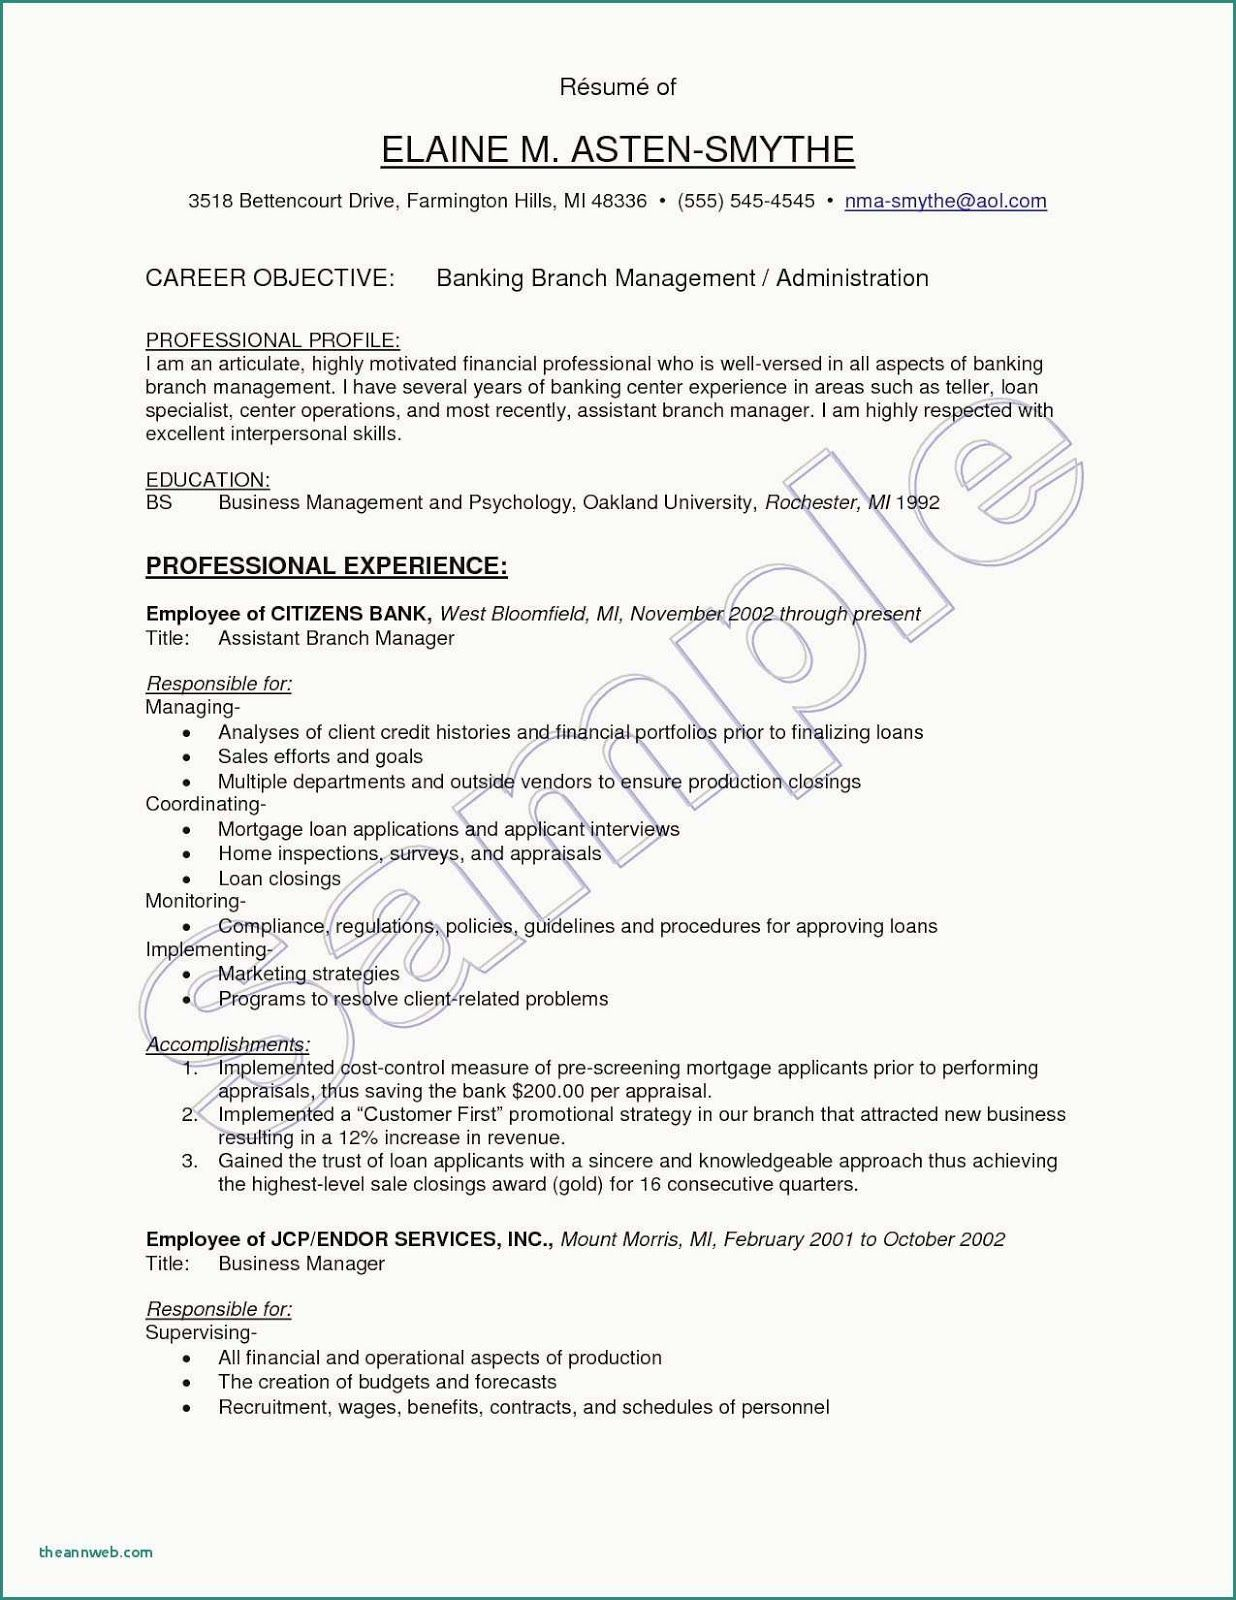 Bank Teller Resume Template 2019 Bank Teller Resume Examples 2020 Click More Photo Resume Resu Resume Objective Examples Marketing Resume Resume Examples